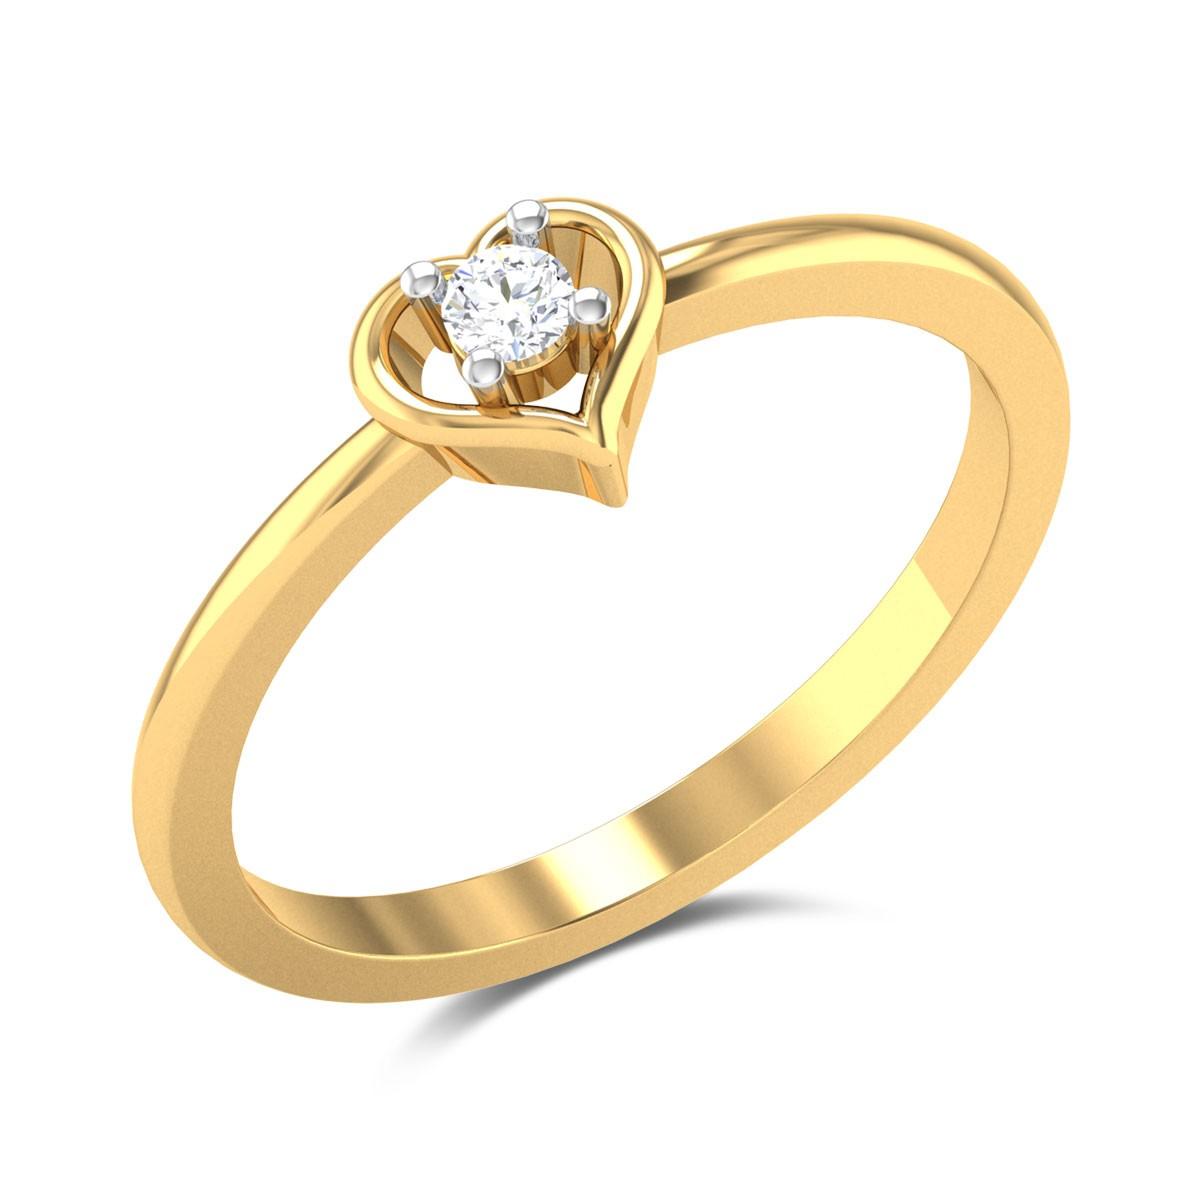 Maria Diamond Studded Gold Ring DJRN5194